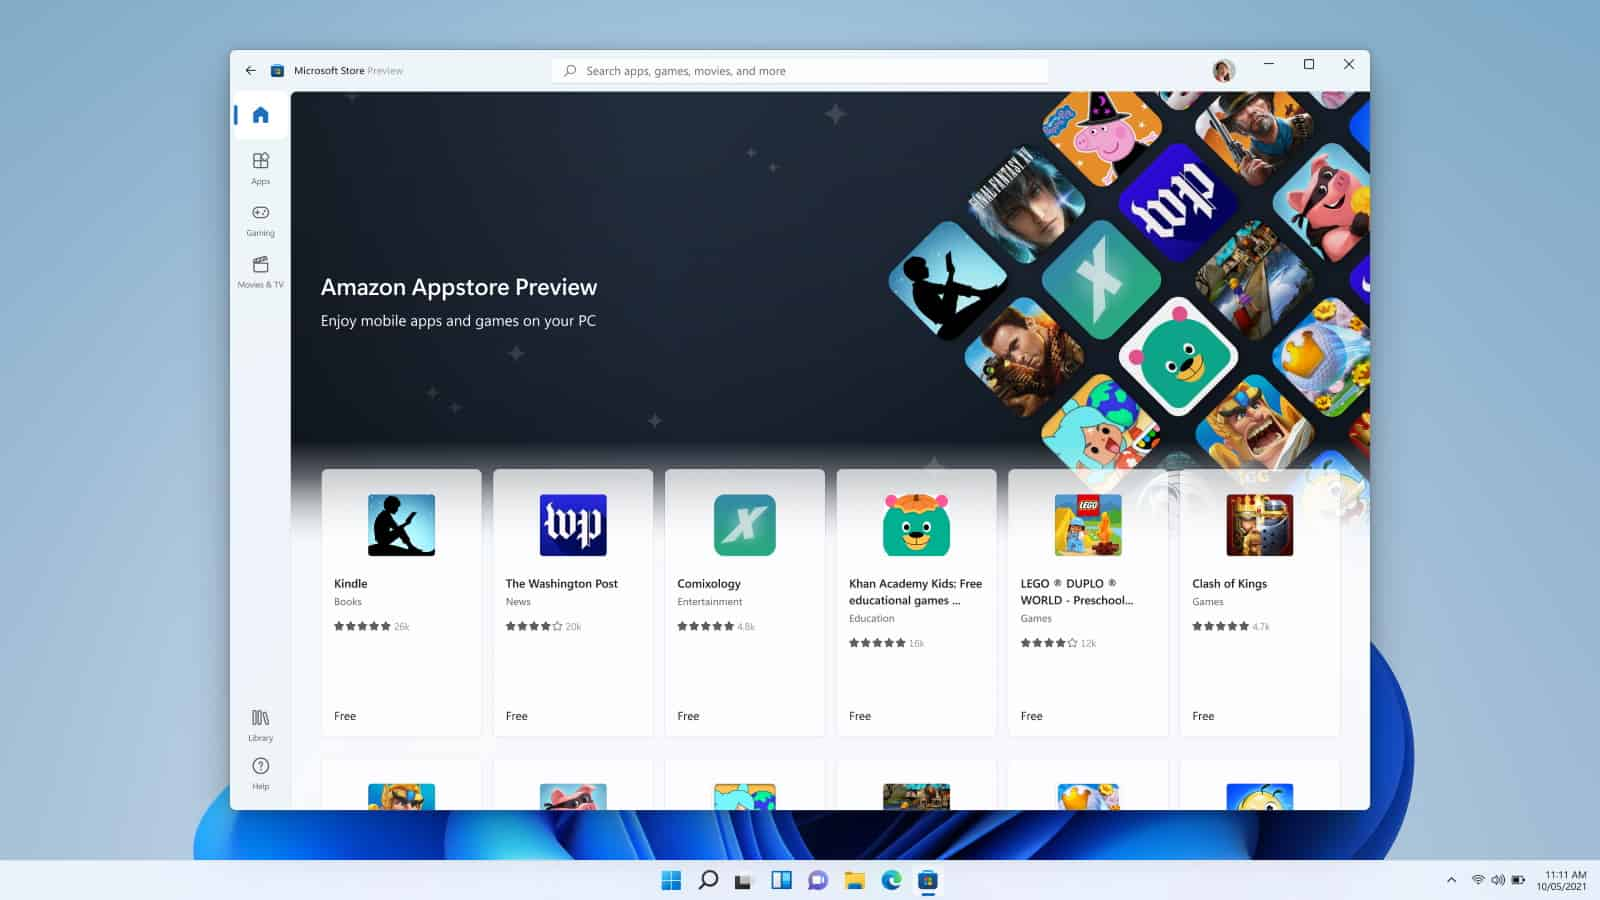 amazon-appstore-preview-windows-11